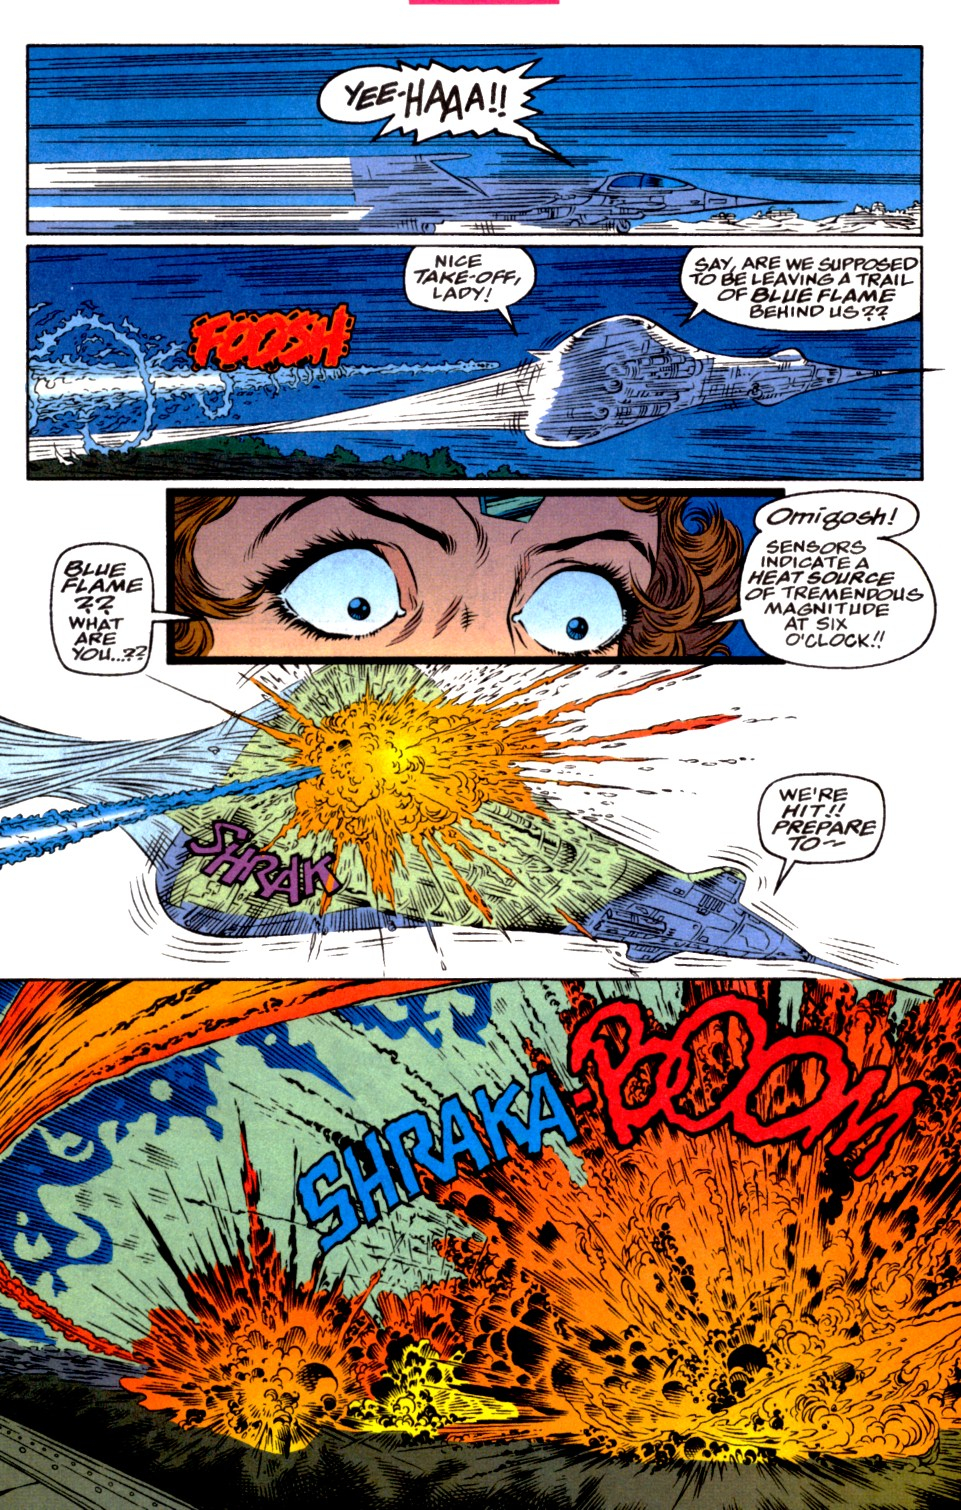 Read online Blackwulf comic -  Issue #2 - 23